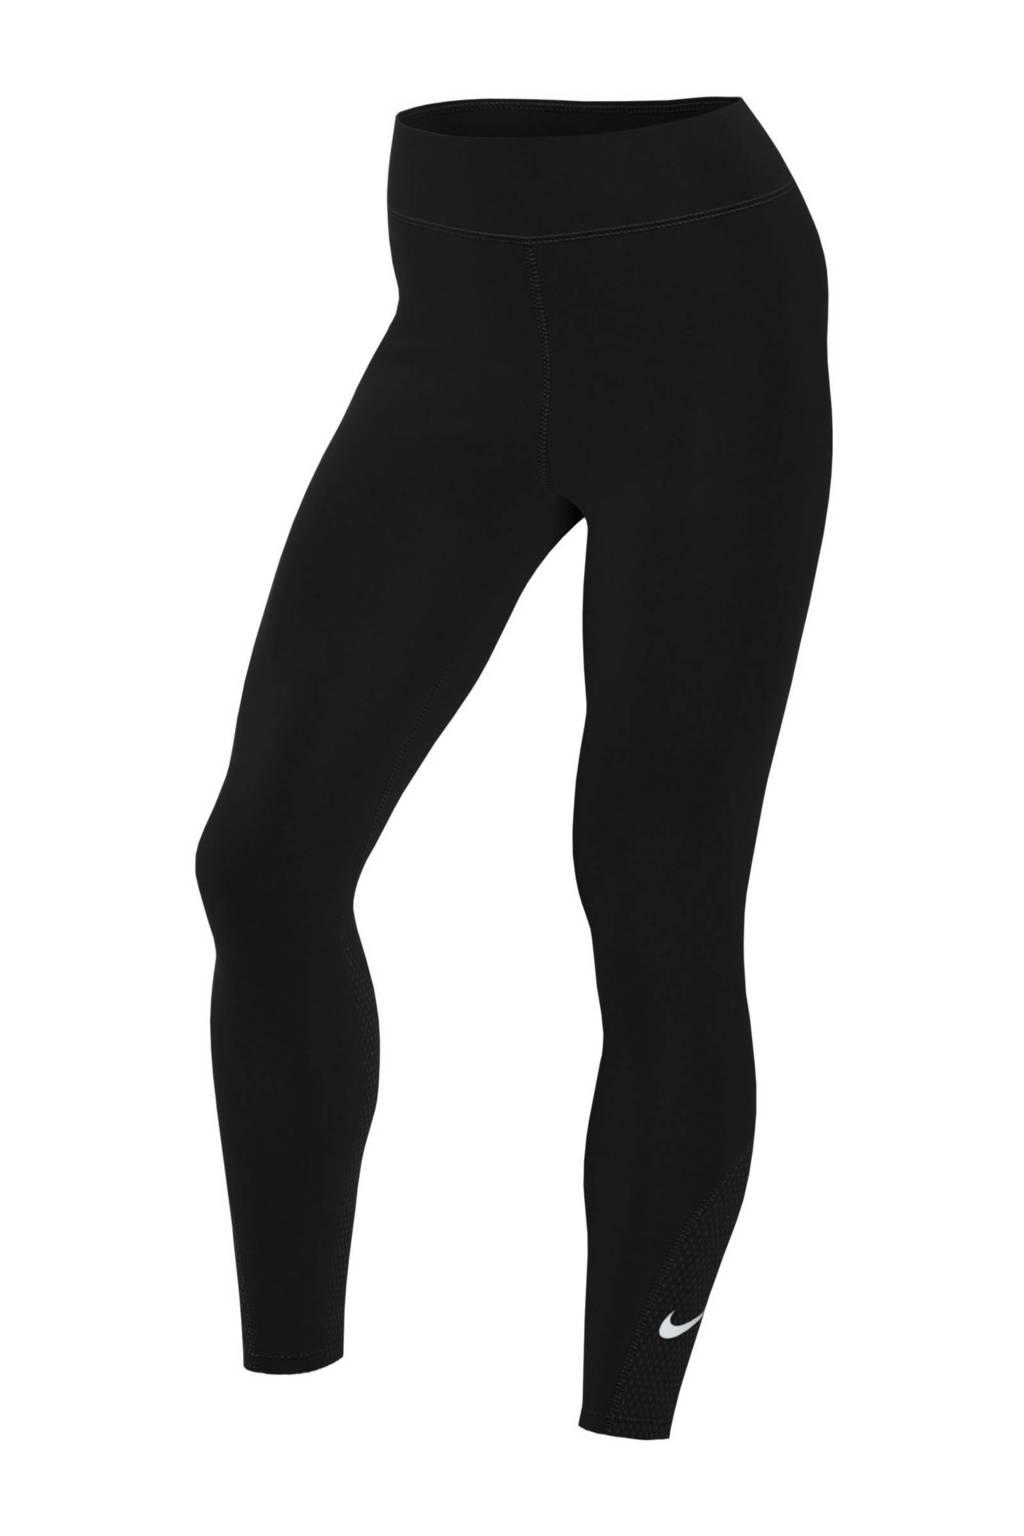 Nike 7/8 sportlegging zwart, Zwart